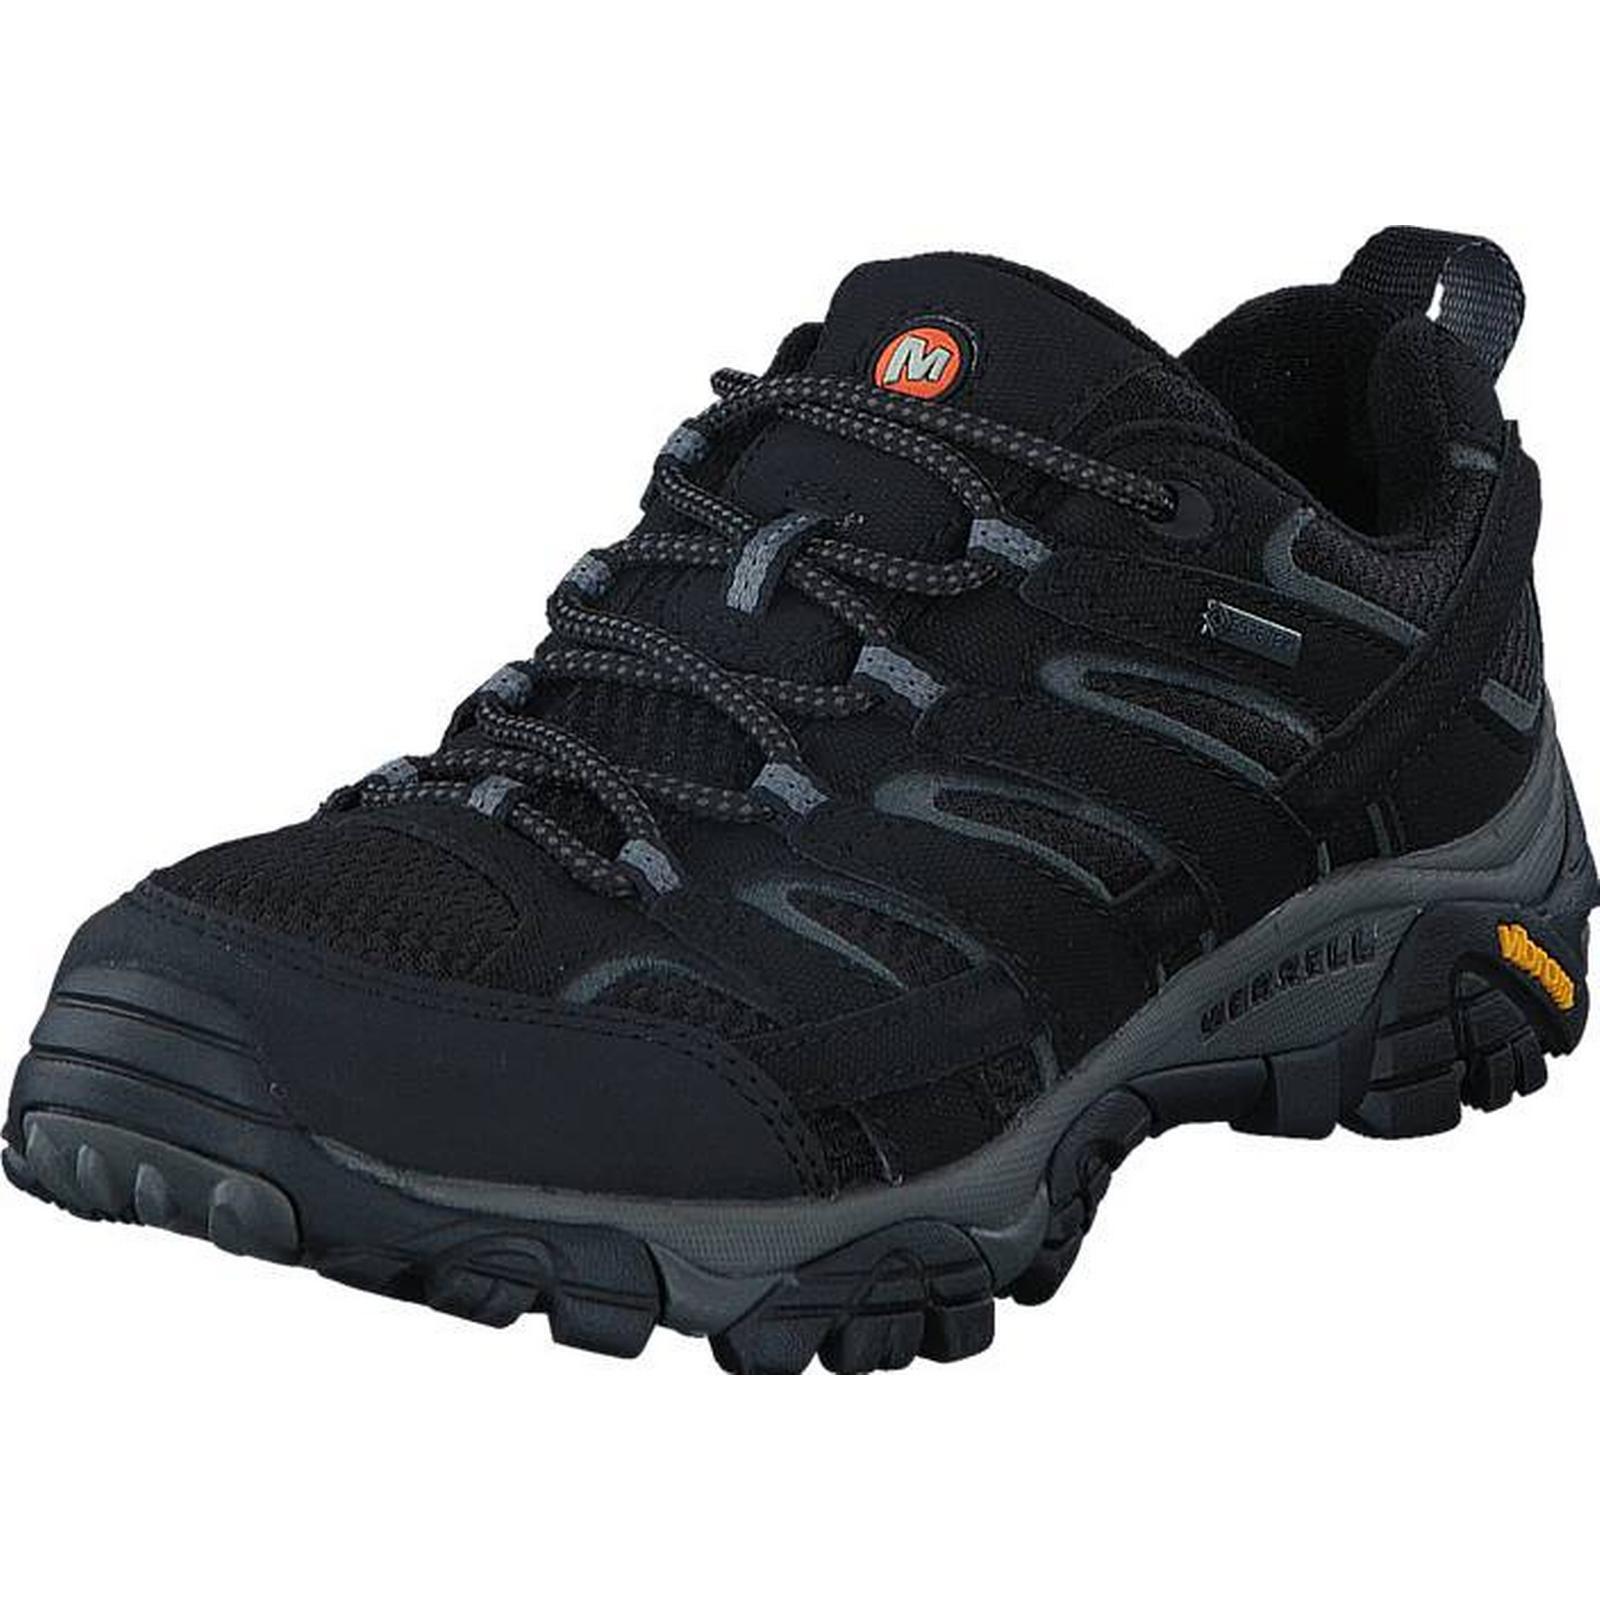 Merrell Moab Moab Merrell 2 GTX Women Black, Shoes, Trainers & Sport Shoes , Walking Shoes, Black, Female, 38 2fb7a8